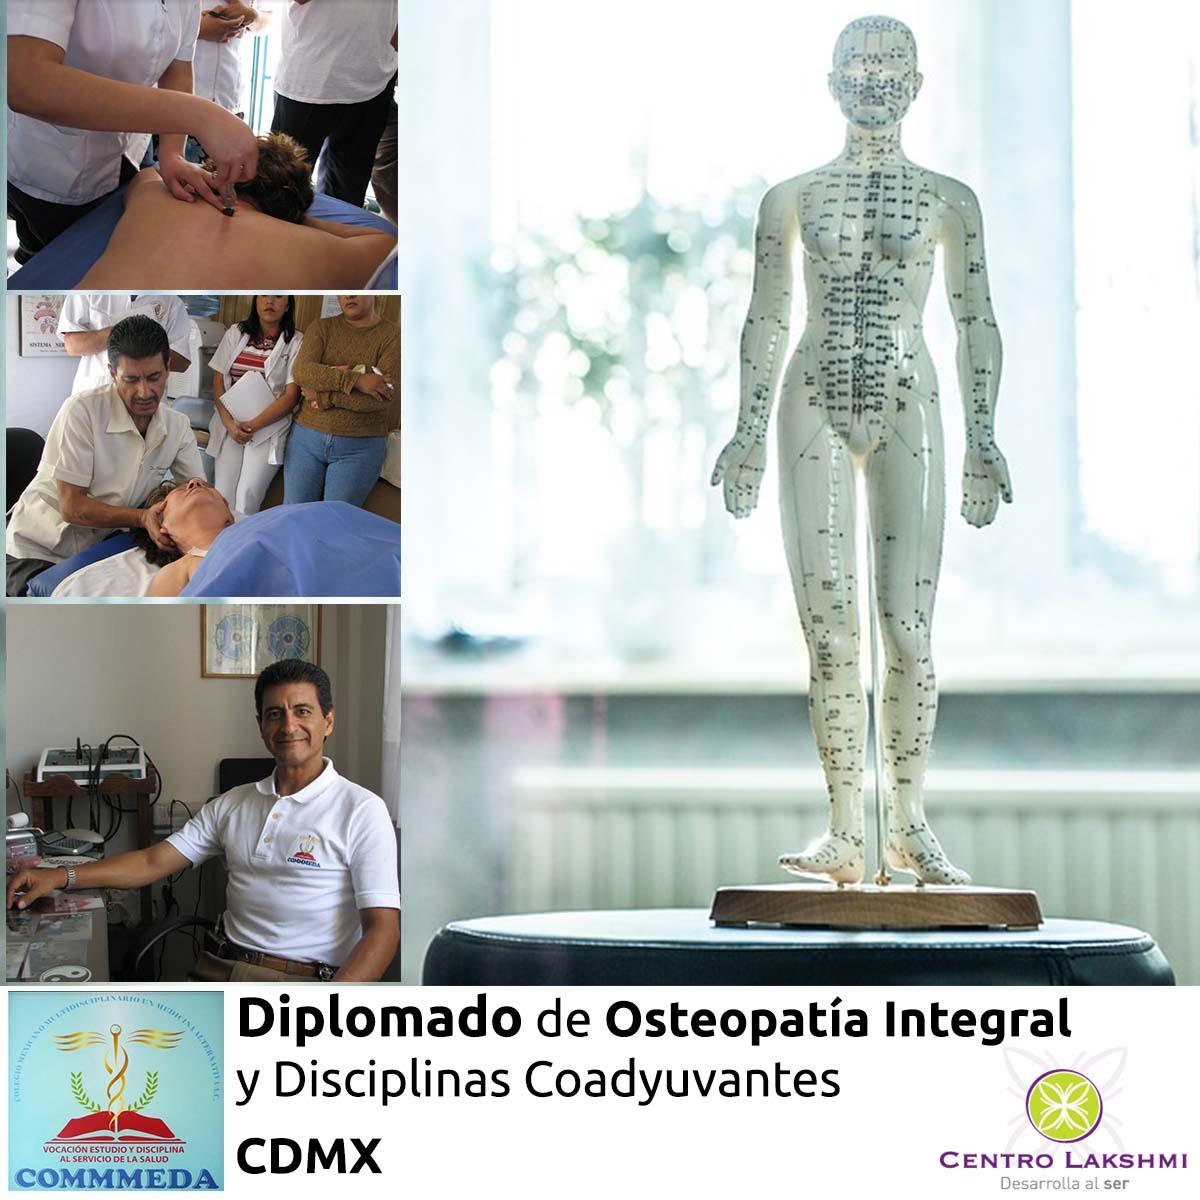 Centro Lakshmi - Taller Diplomado Osteopatia